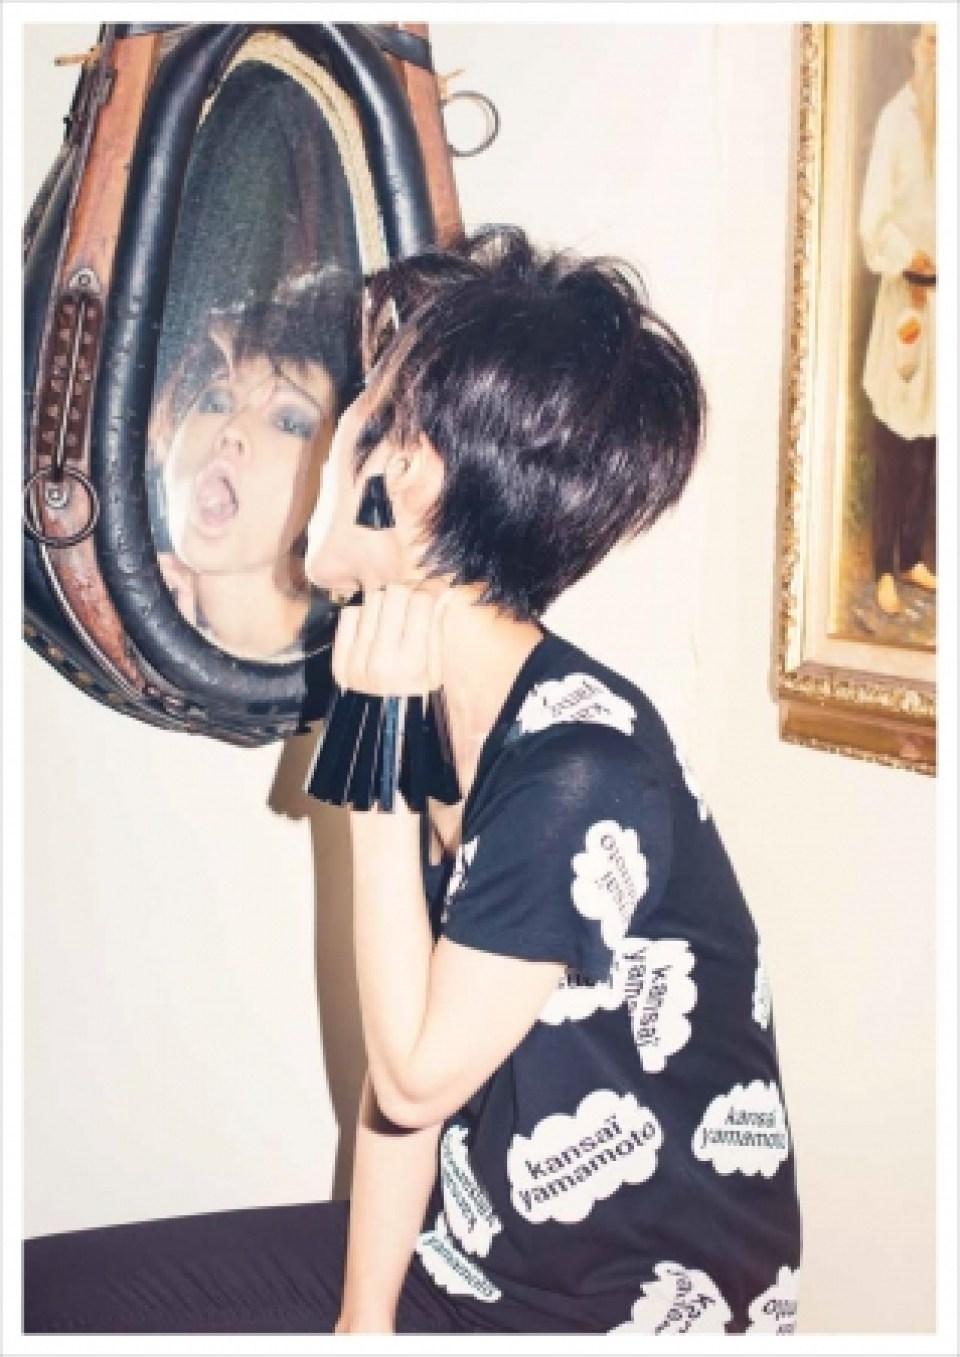 〈KANSAI YAMAMOTO〉Tシャツ12,960円(税込)